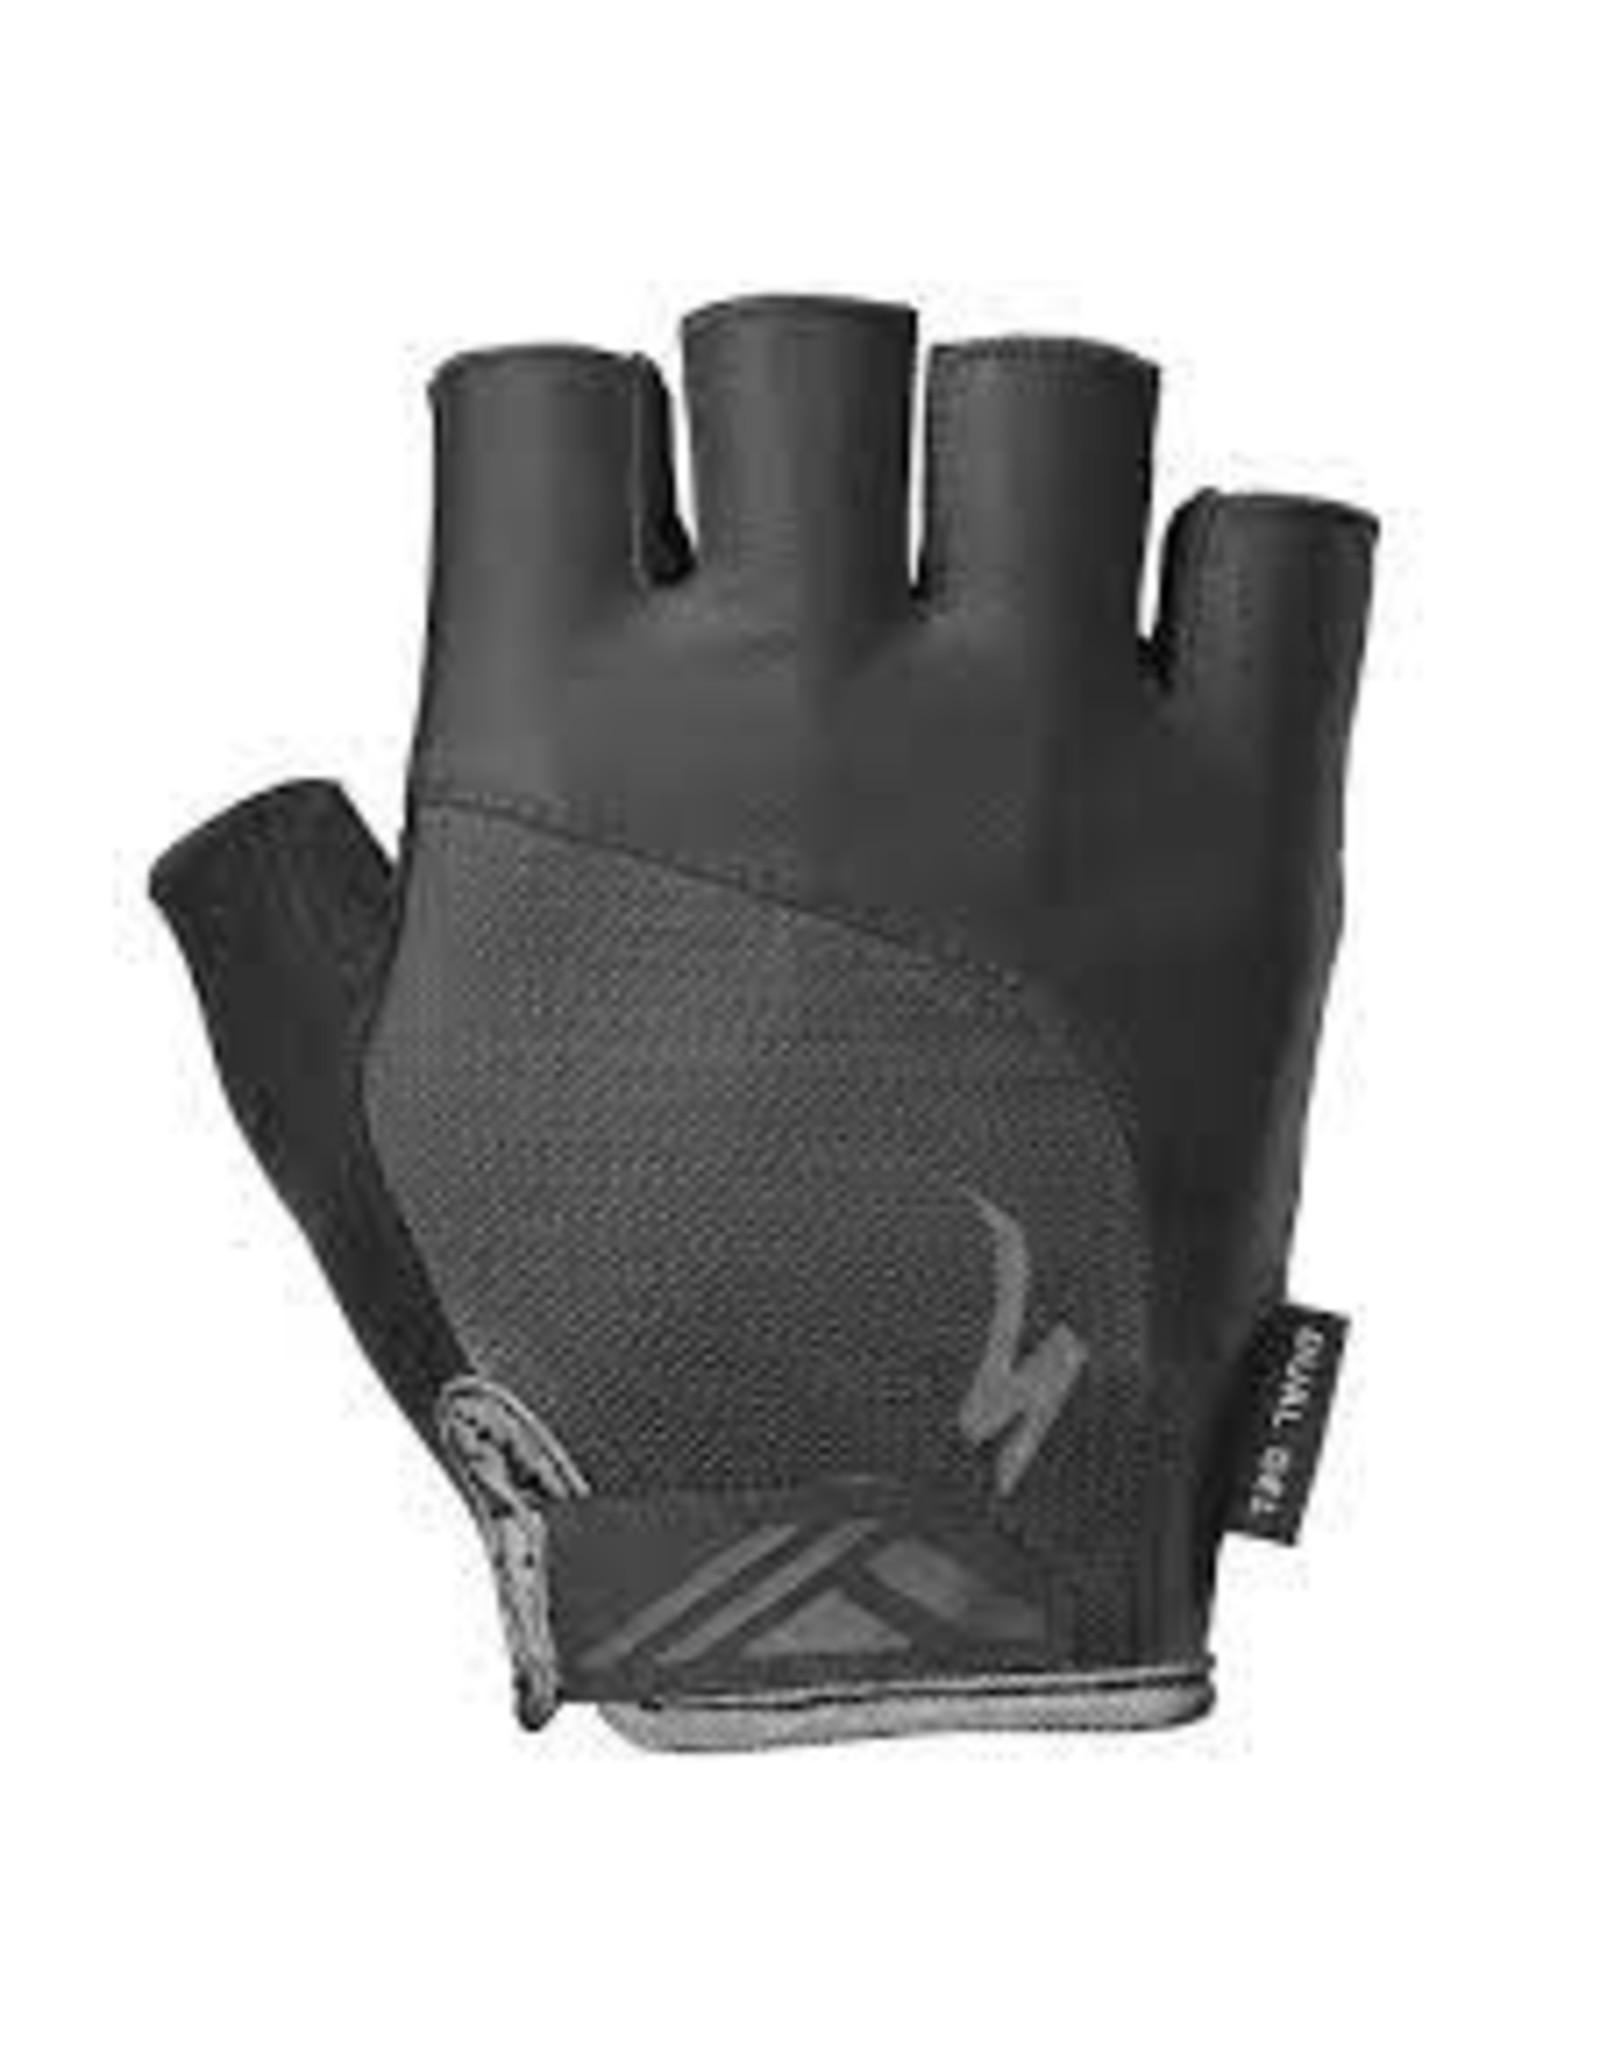 Specialized Glove Spec BG Dual Gel SF Blk Small